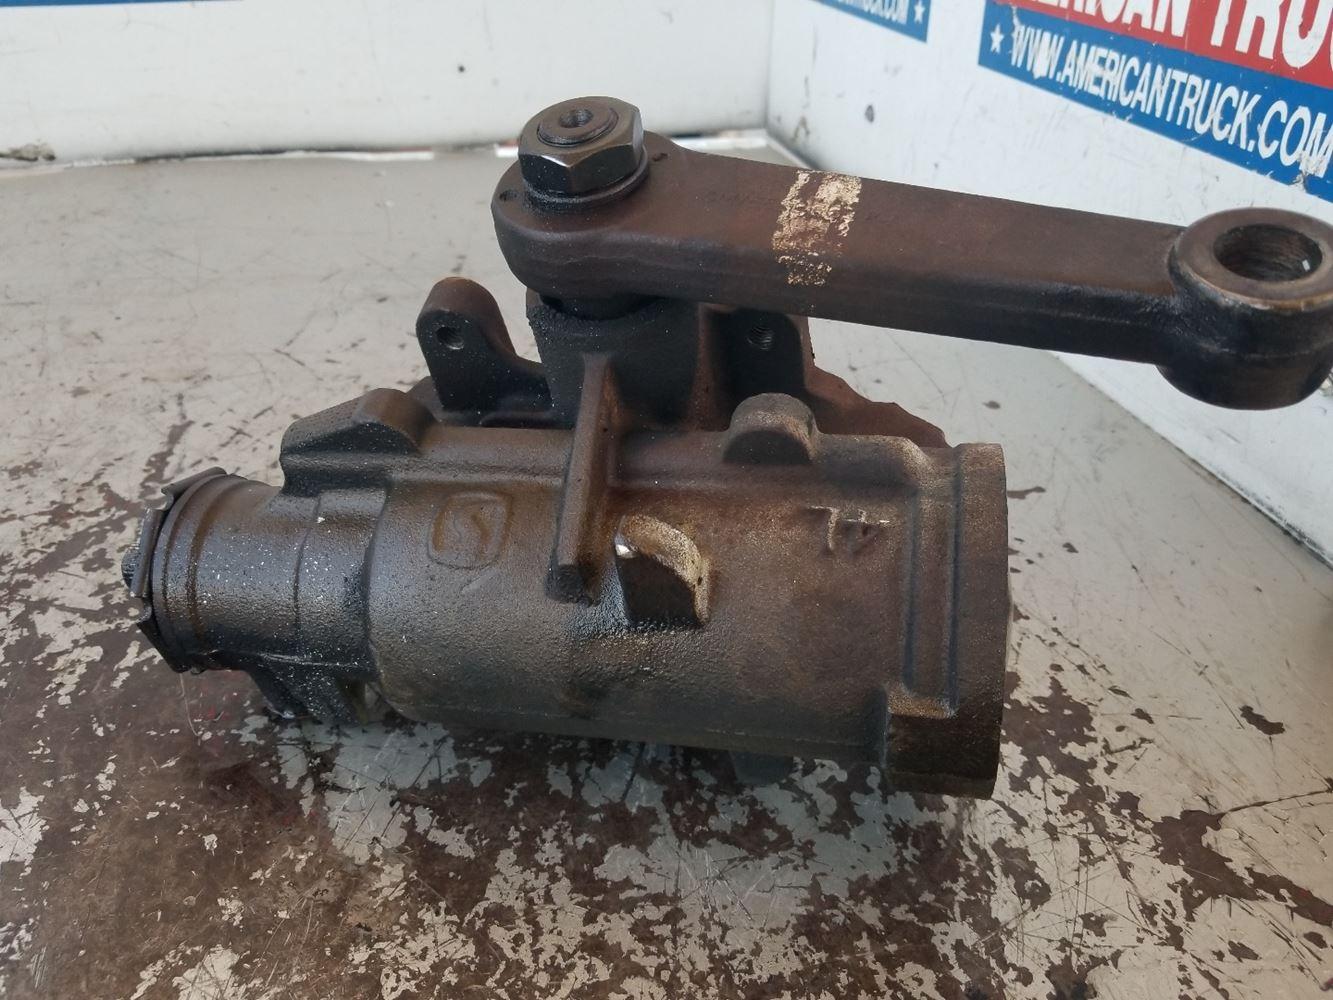 Used Steering & Steering Parts - Steering Gears for 1995 CHEVROLET P30 for sale-59049439